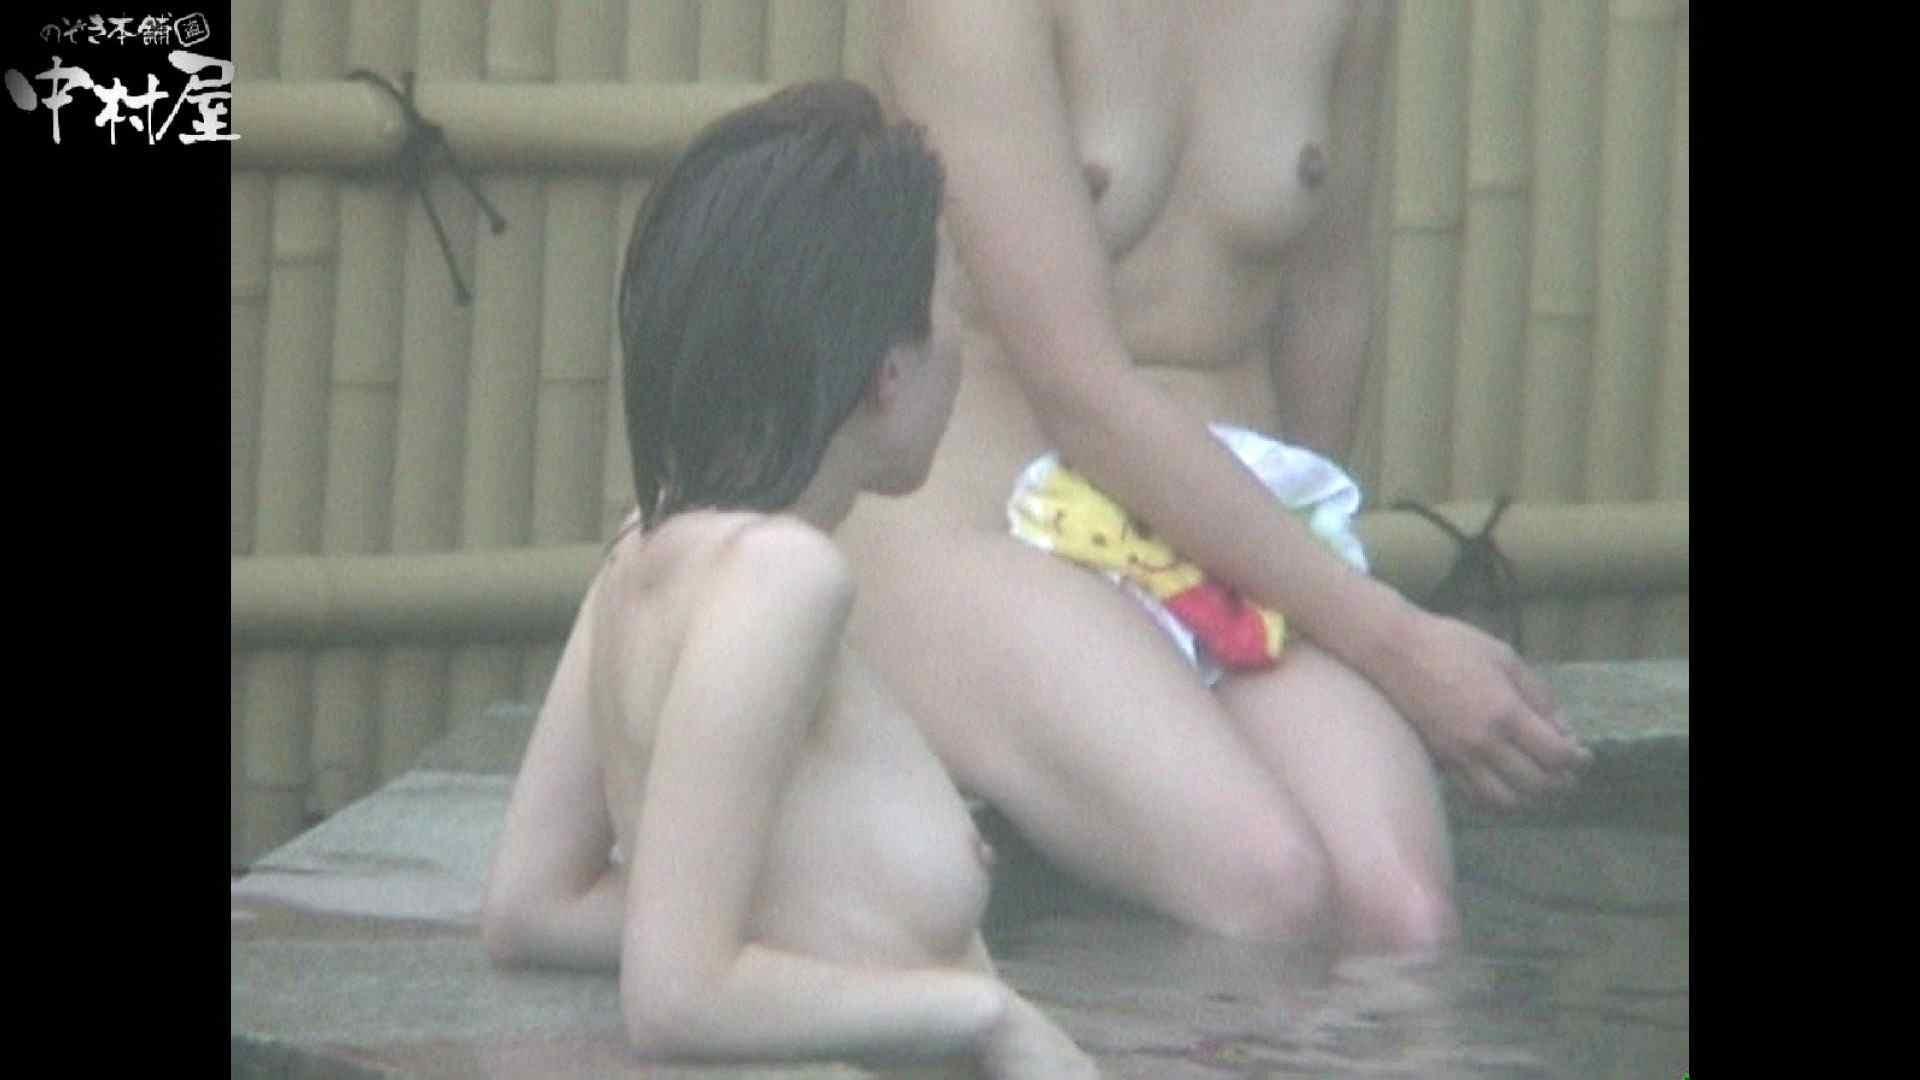 Aquaな露天風呂Vol.932 盗撮特撮 濡れ場動画紹介 11pic 8